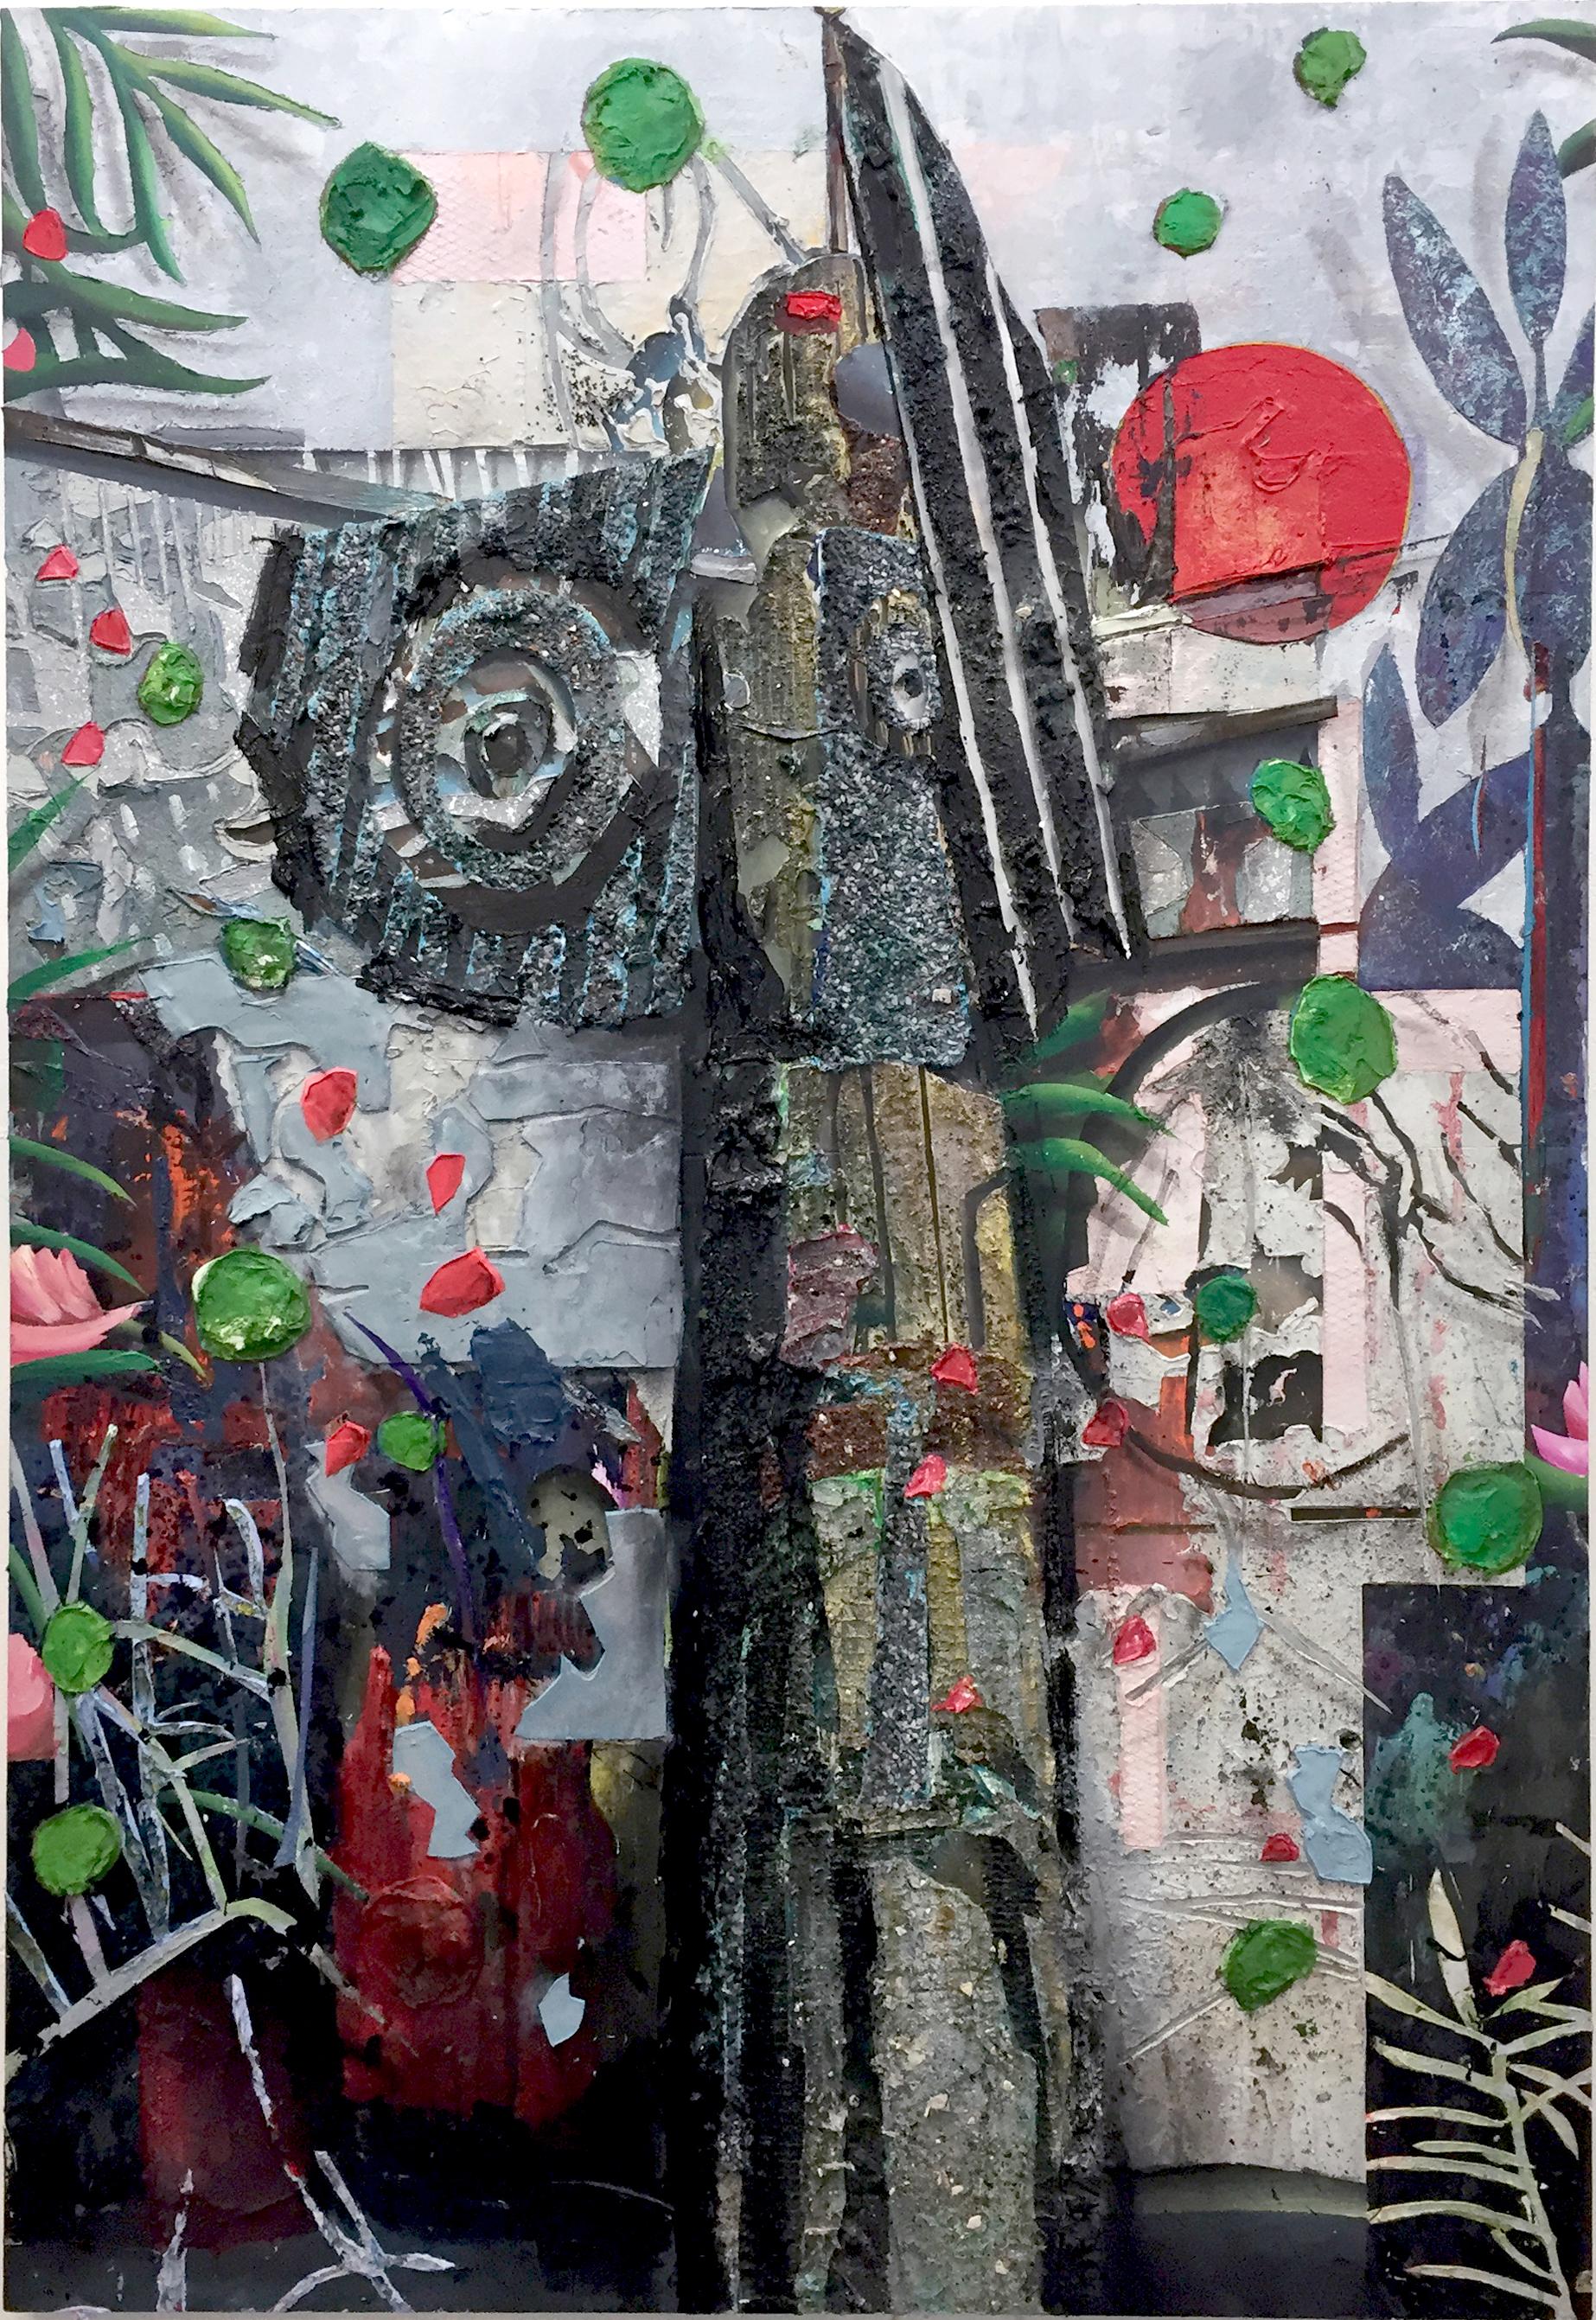 Totem 180x 22 cm acrylics, plaster, dirt, stone on canvas on wood panel